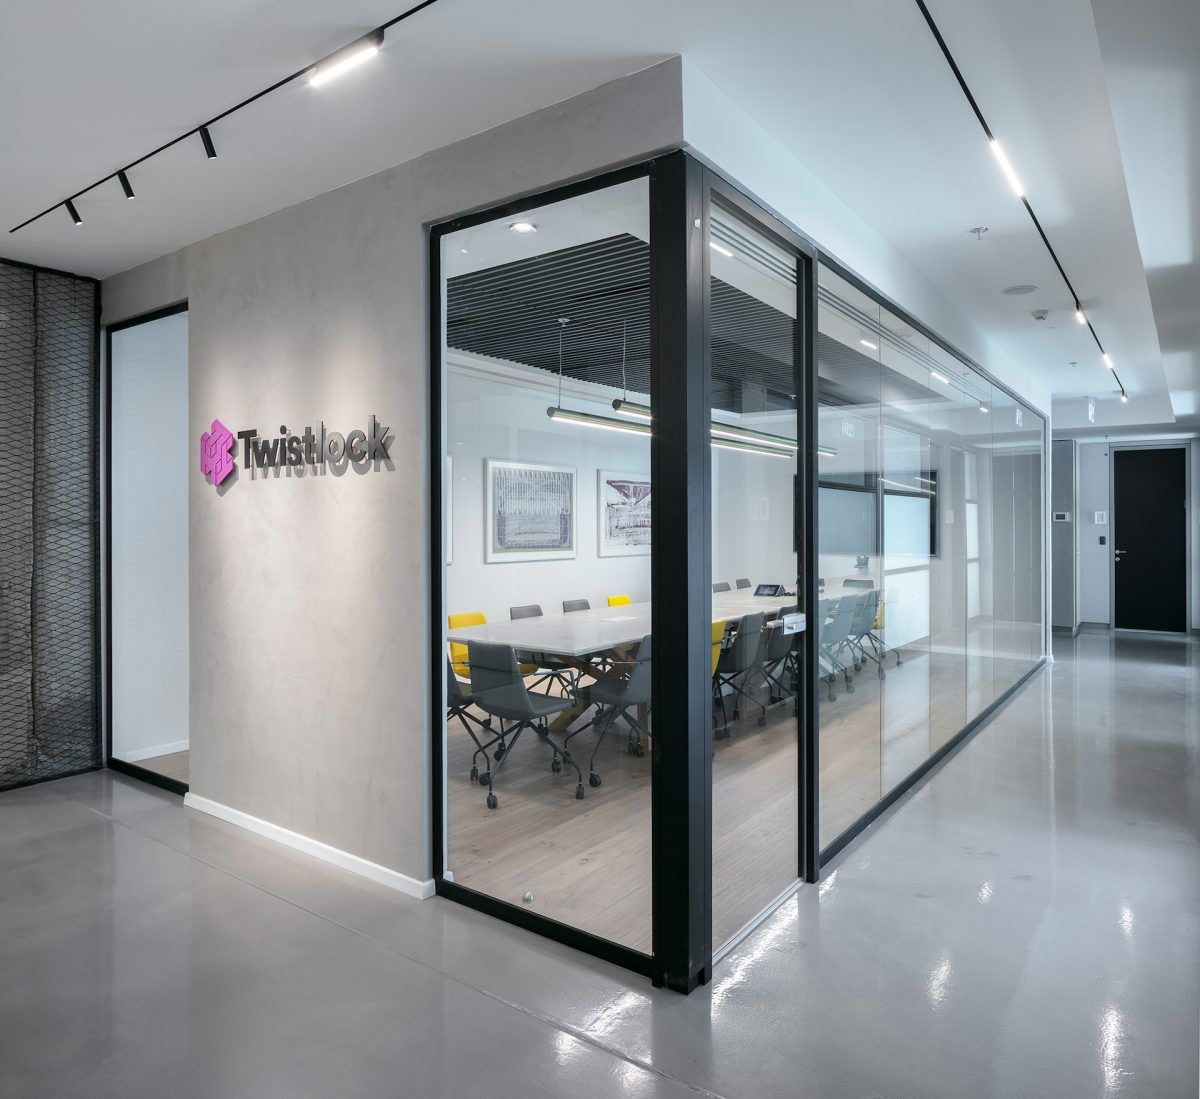 Twistlock Office Space מסדרונות מחוץ לחדר הישיבות מואר בתאורה מיוחדת בביצועו של קמחי דורי